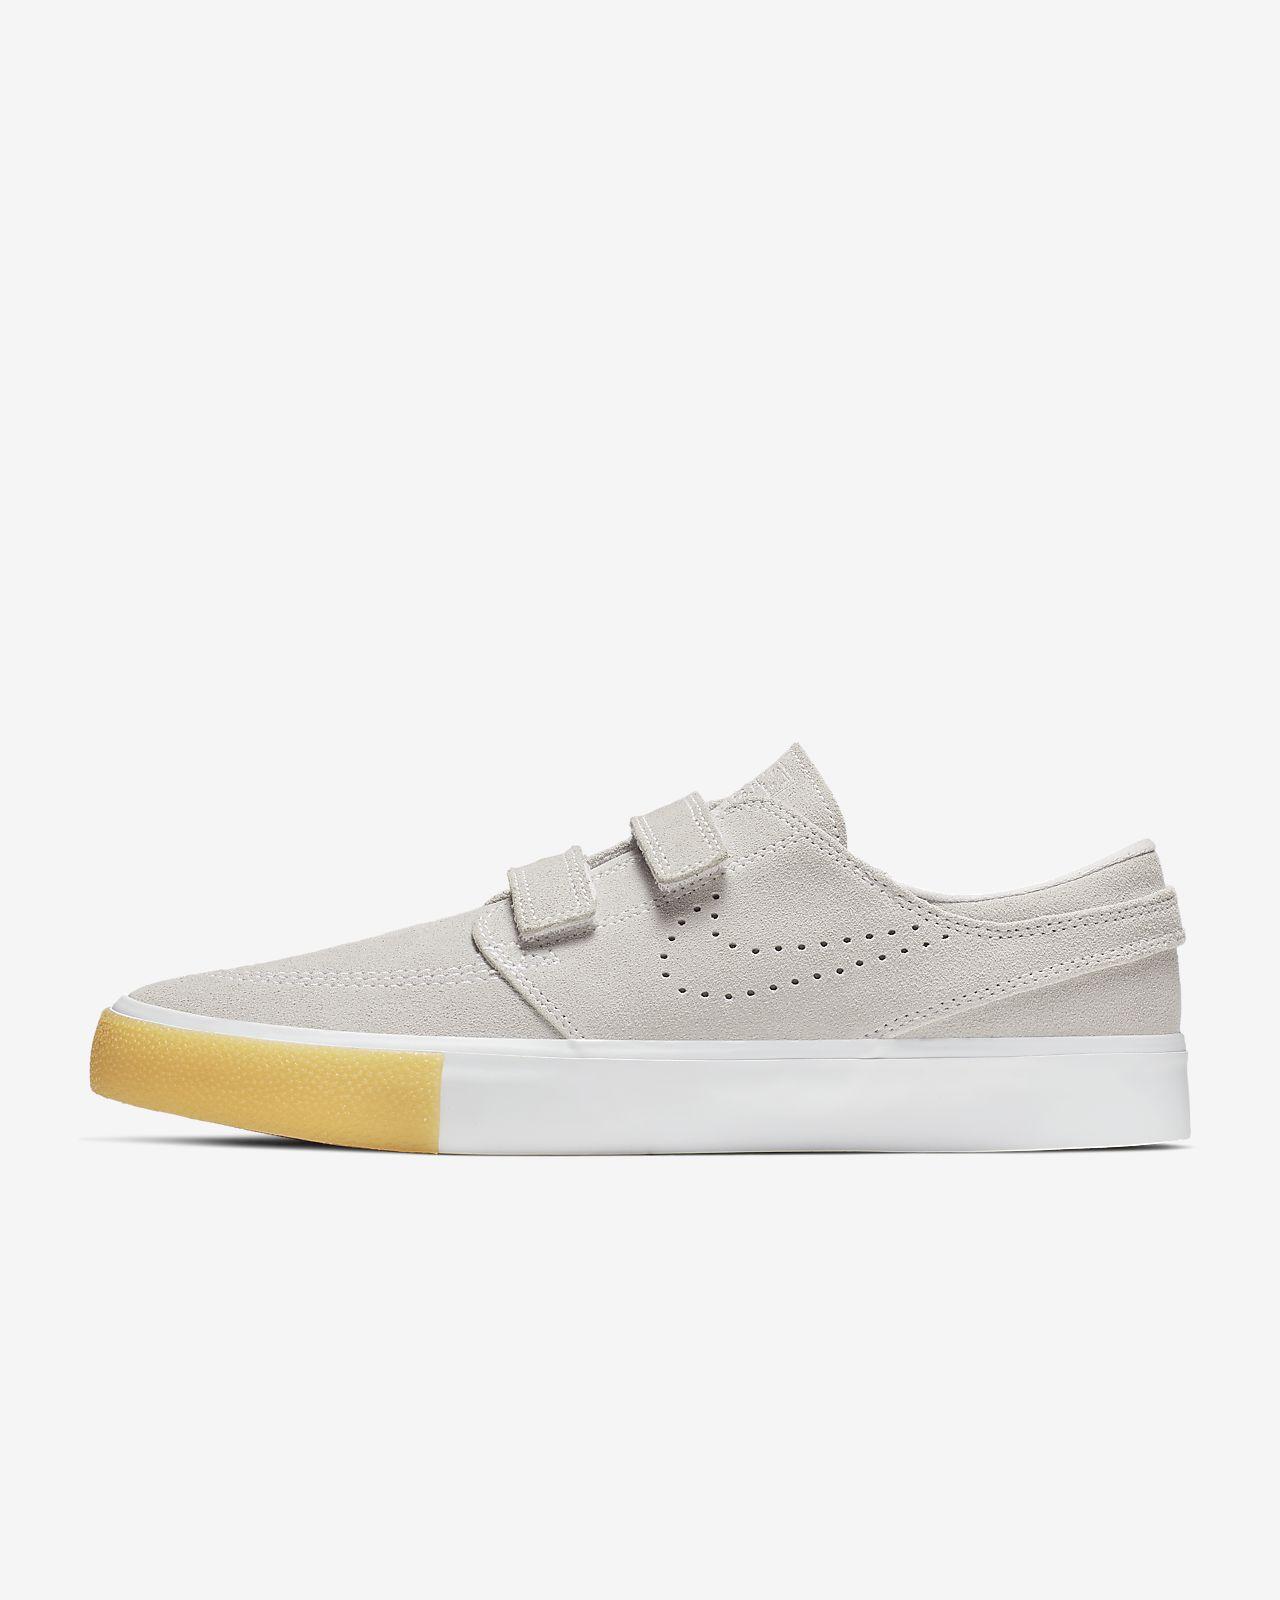 Buty do skateboardingu Nike SB Zoom Stefan Janoski AC RM SE